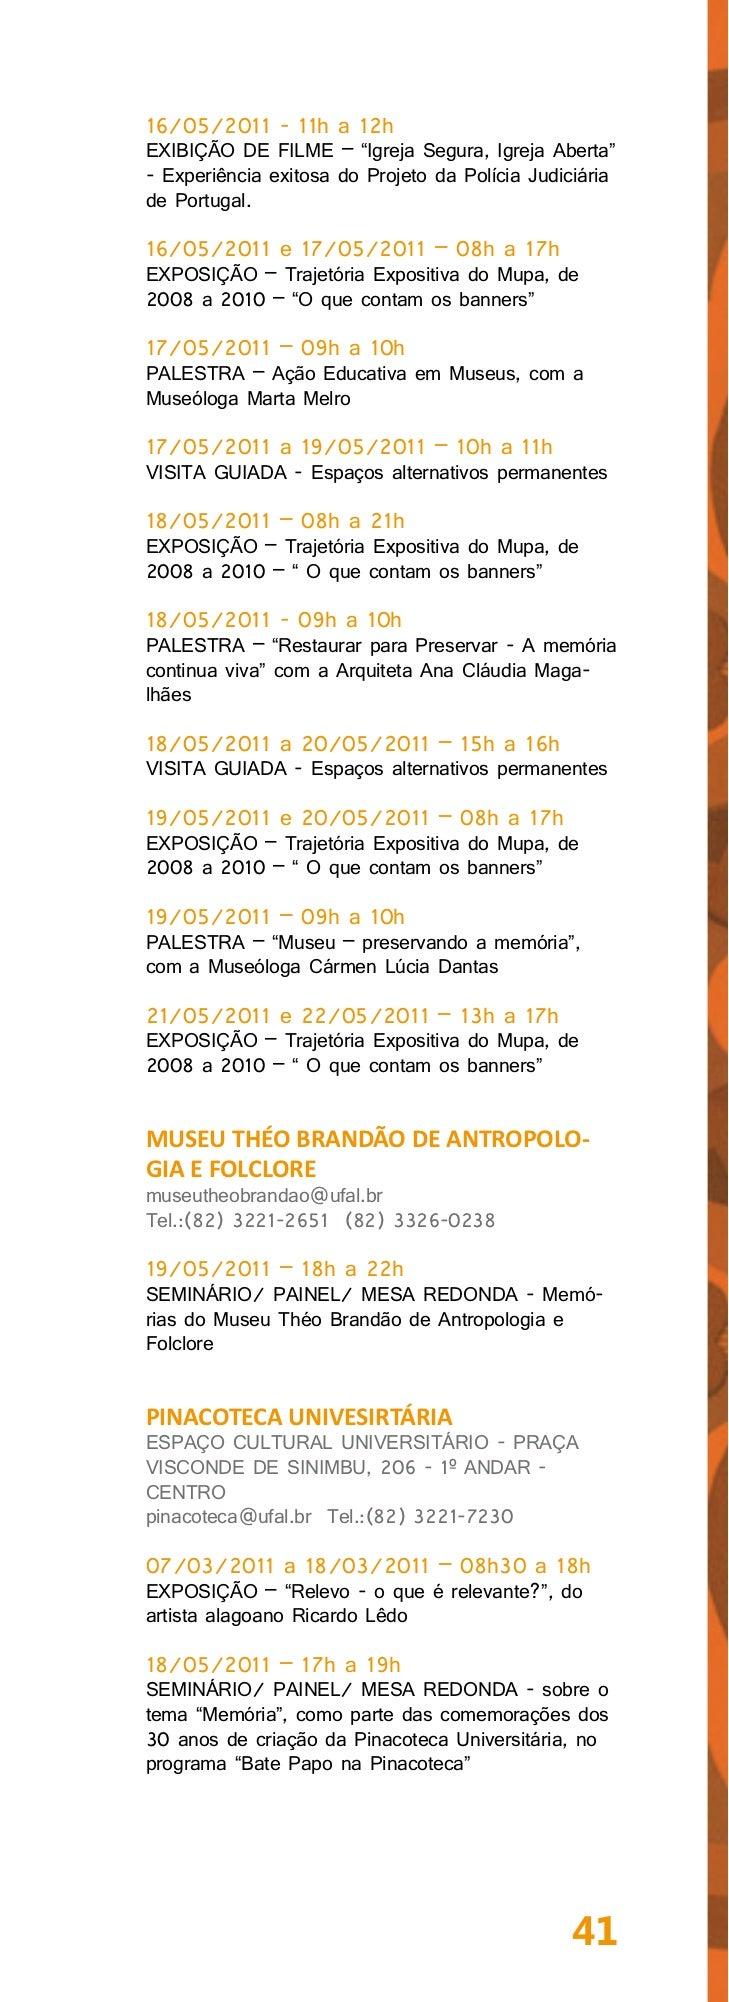 AL - MARAVILHAMUSEU PALEONTOLÓGICO OTAVIANOFLORENTINO RITIRPRAÇA FRANCISCO SOARES, 29 - CENTROsedumaravilha@ig.com.brTel:(...